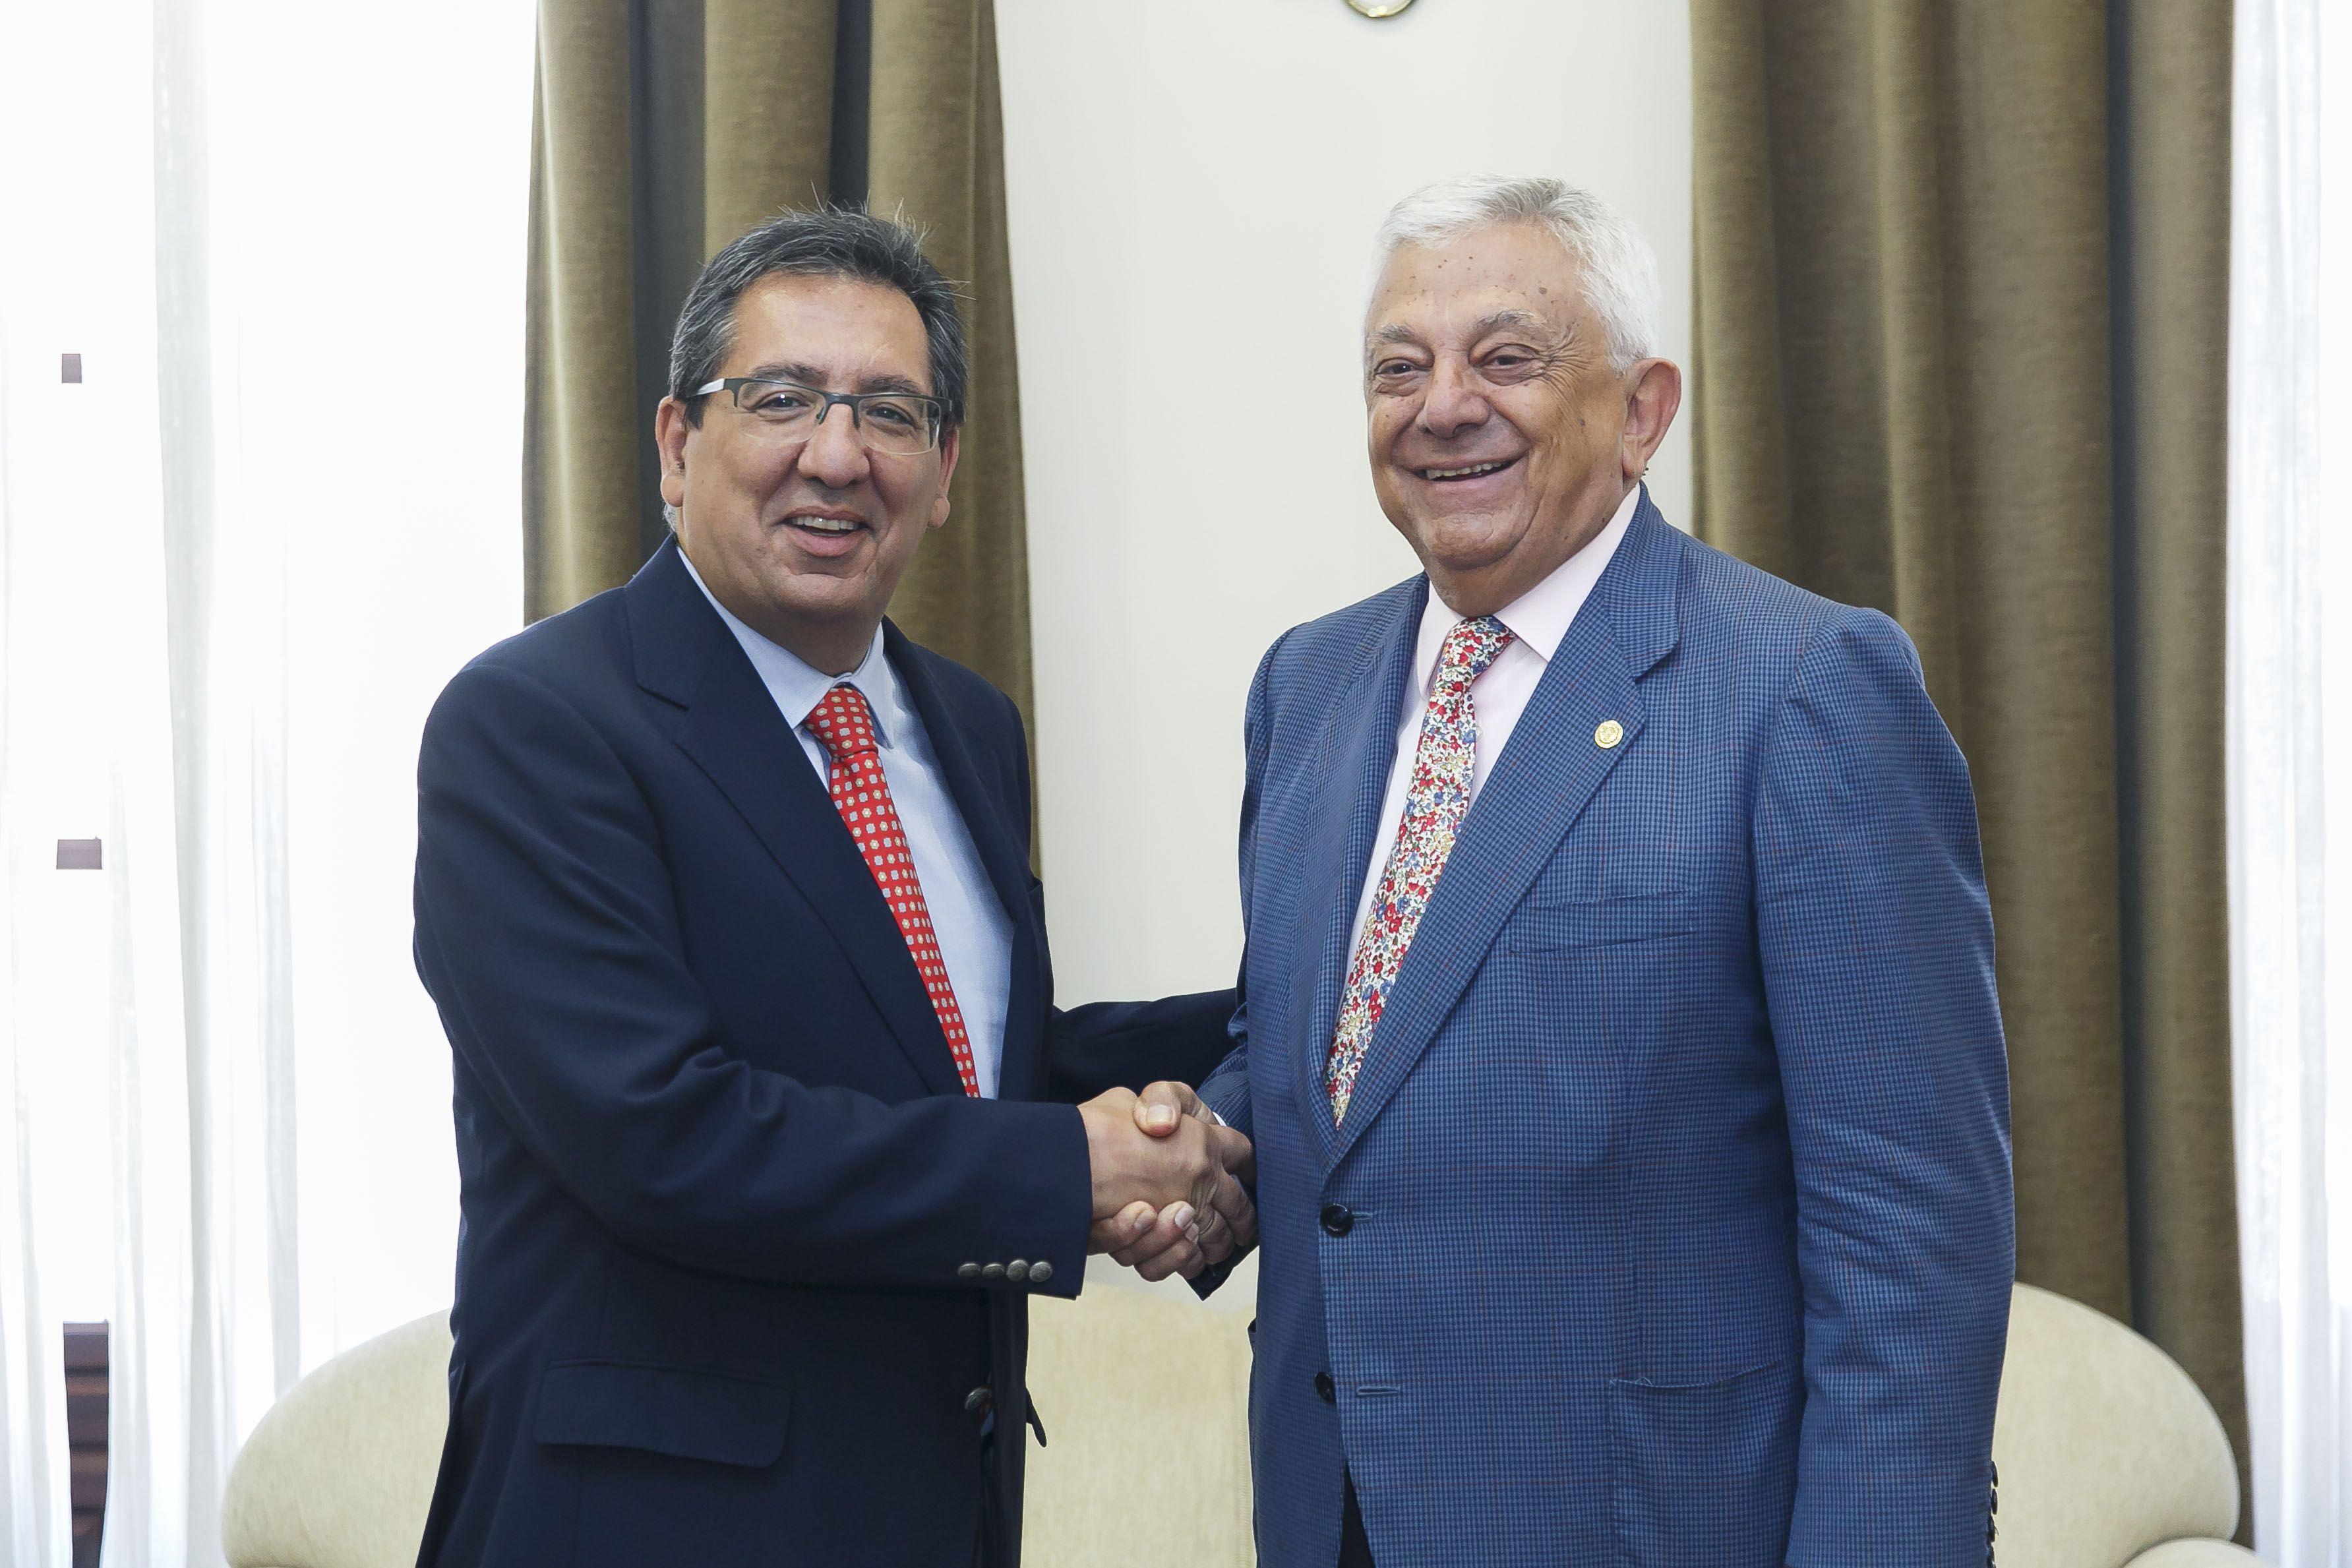 Un nuevo paso hacia Iberoamérica